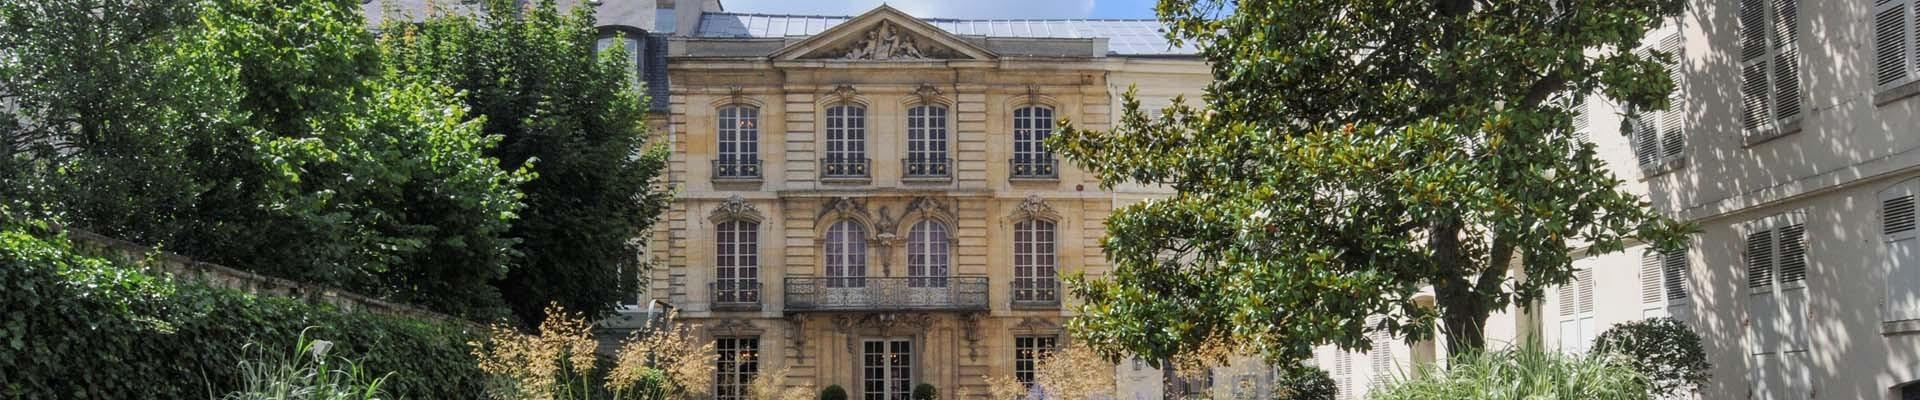 Musée Lambinet